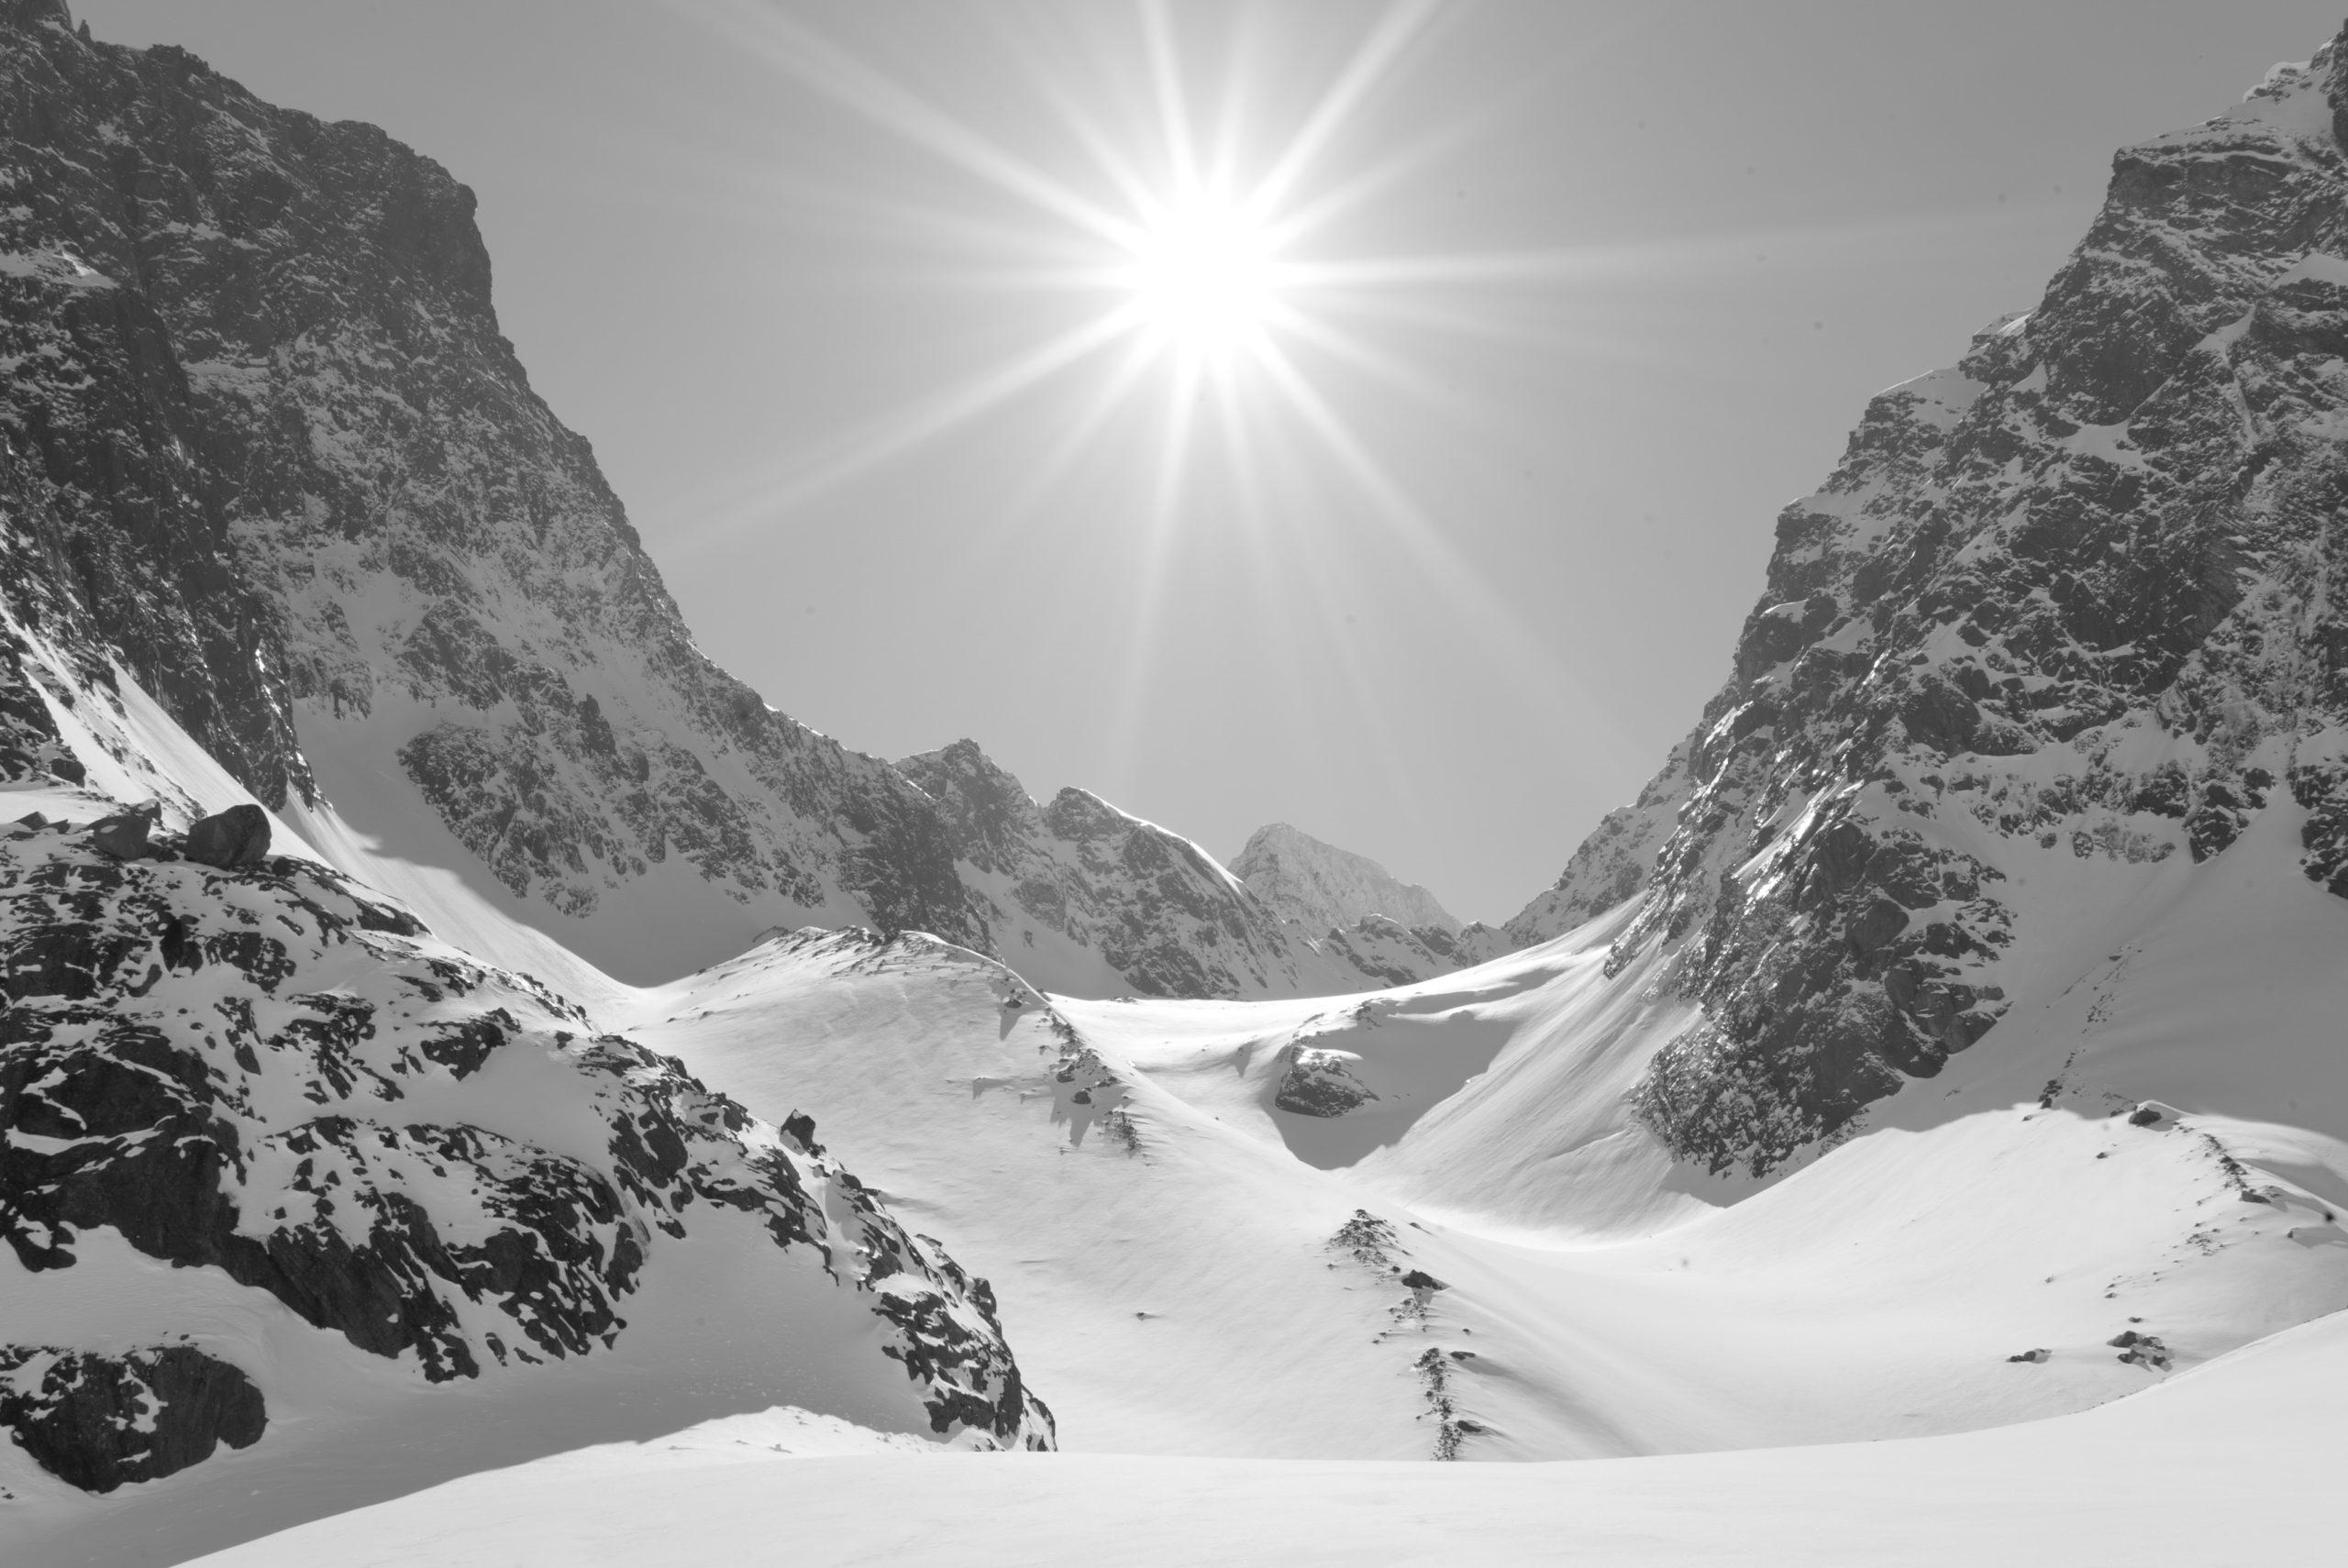 Black and white beauty © Hendrik morkel